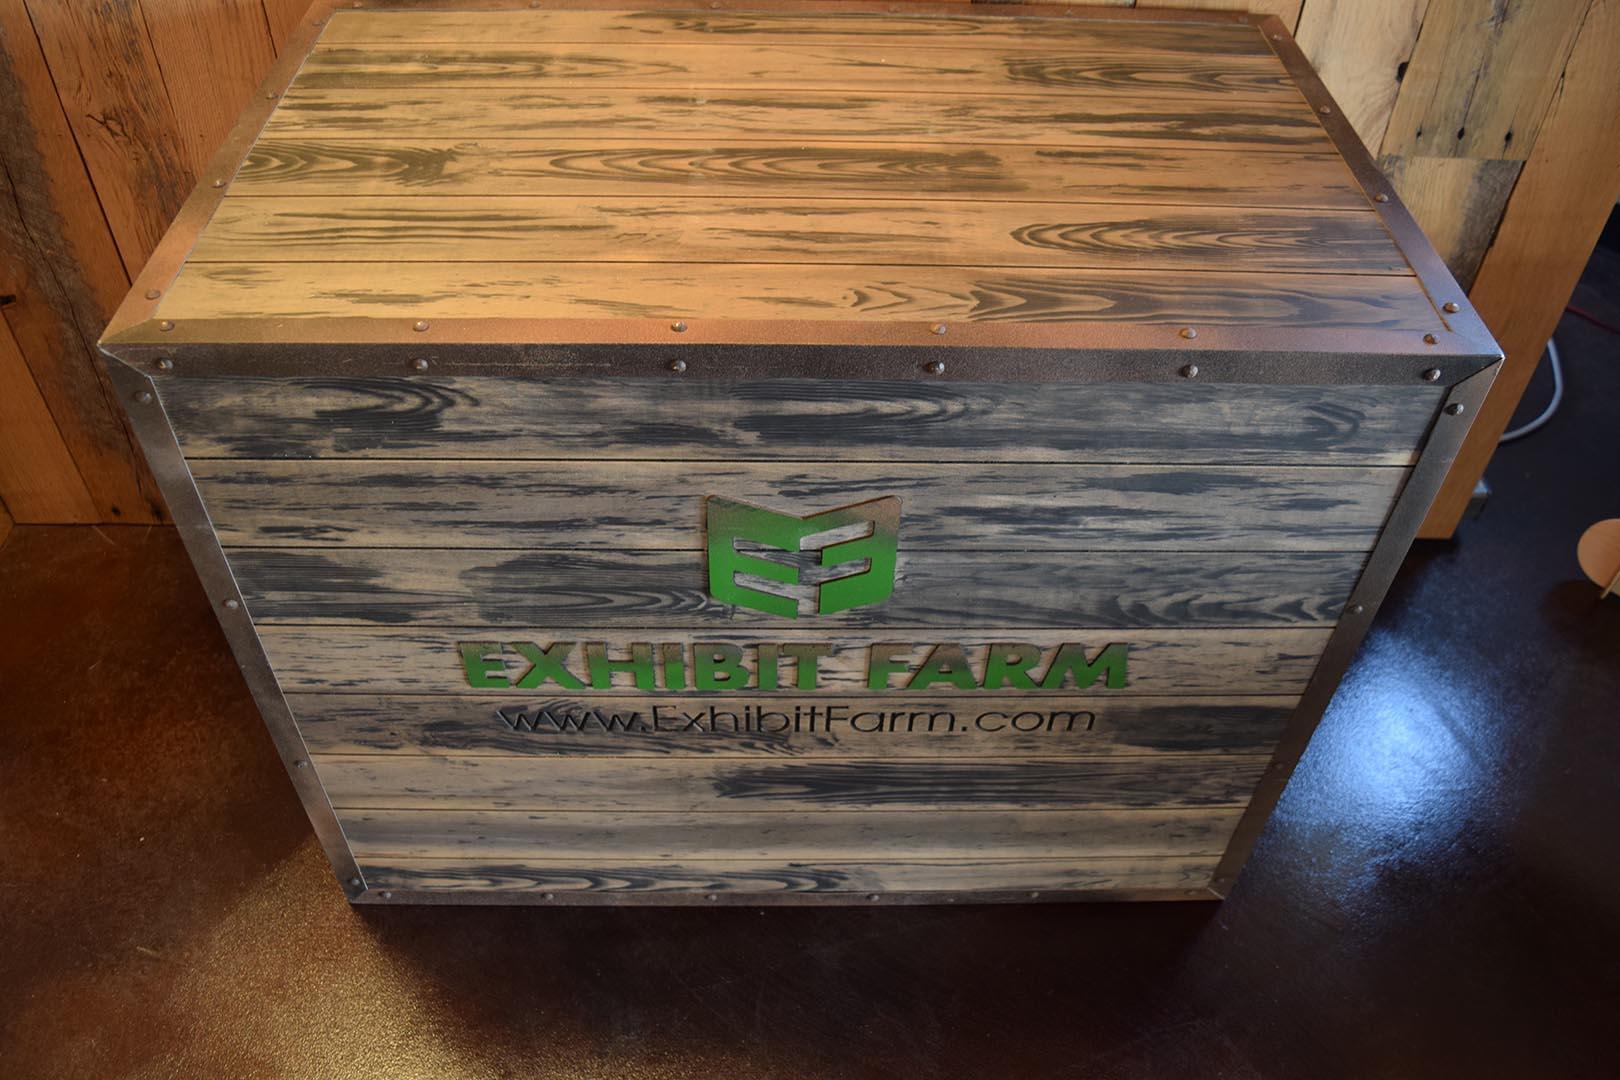 Exhibit Farm Booth Crates